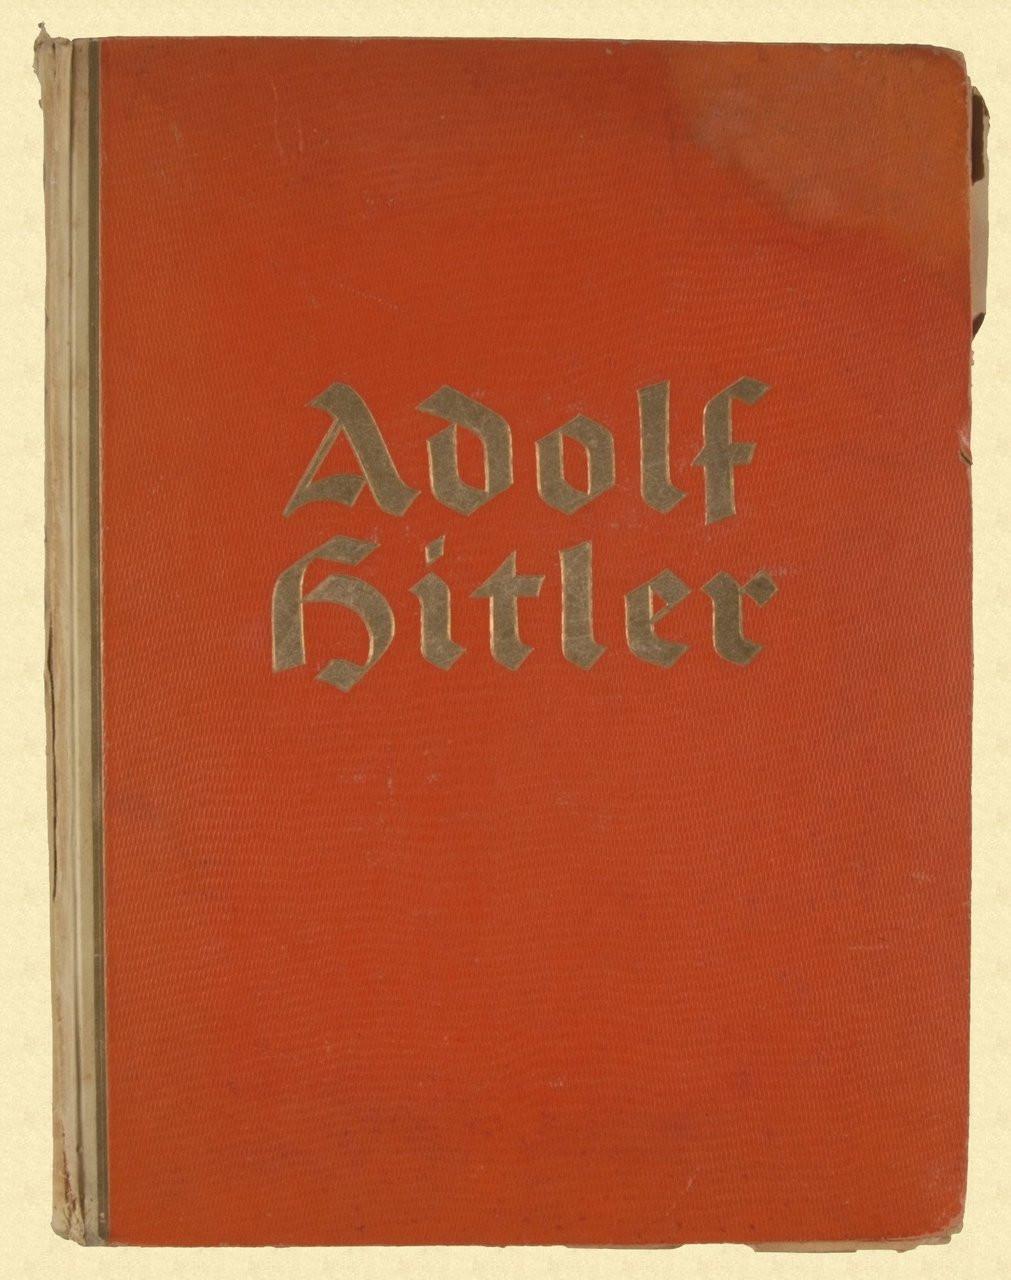 GERMAN WW2 BOOK - C11197